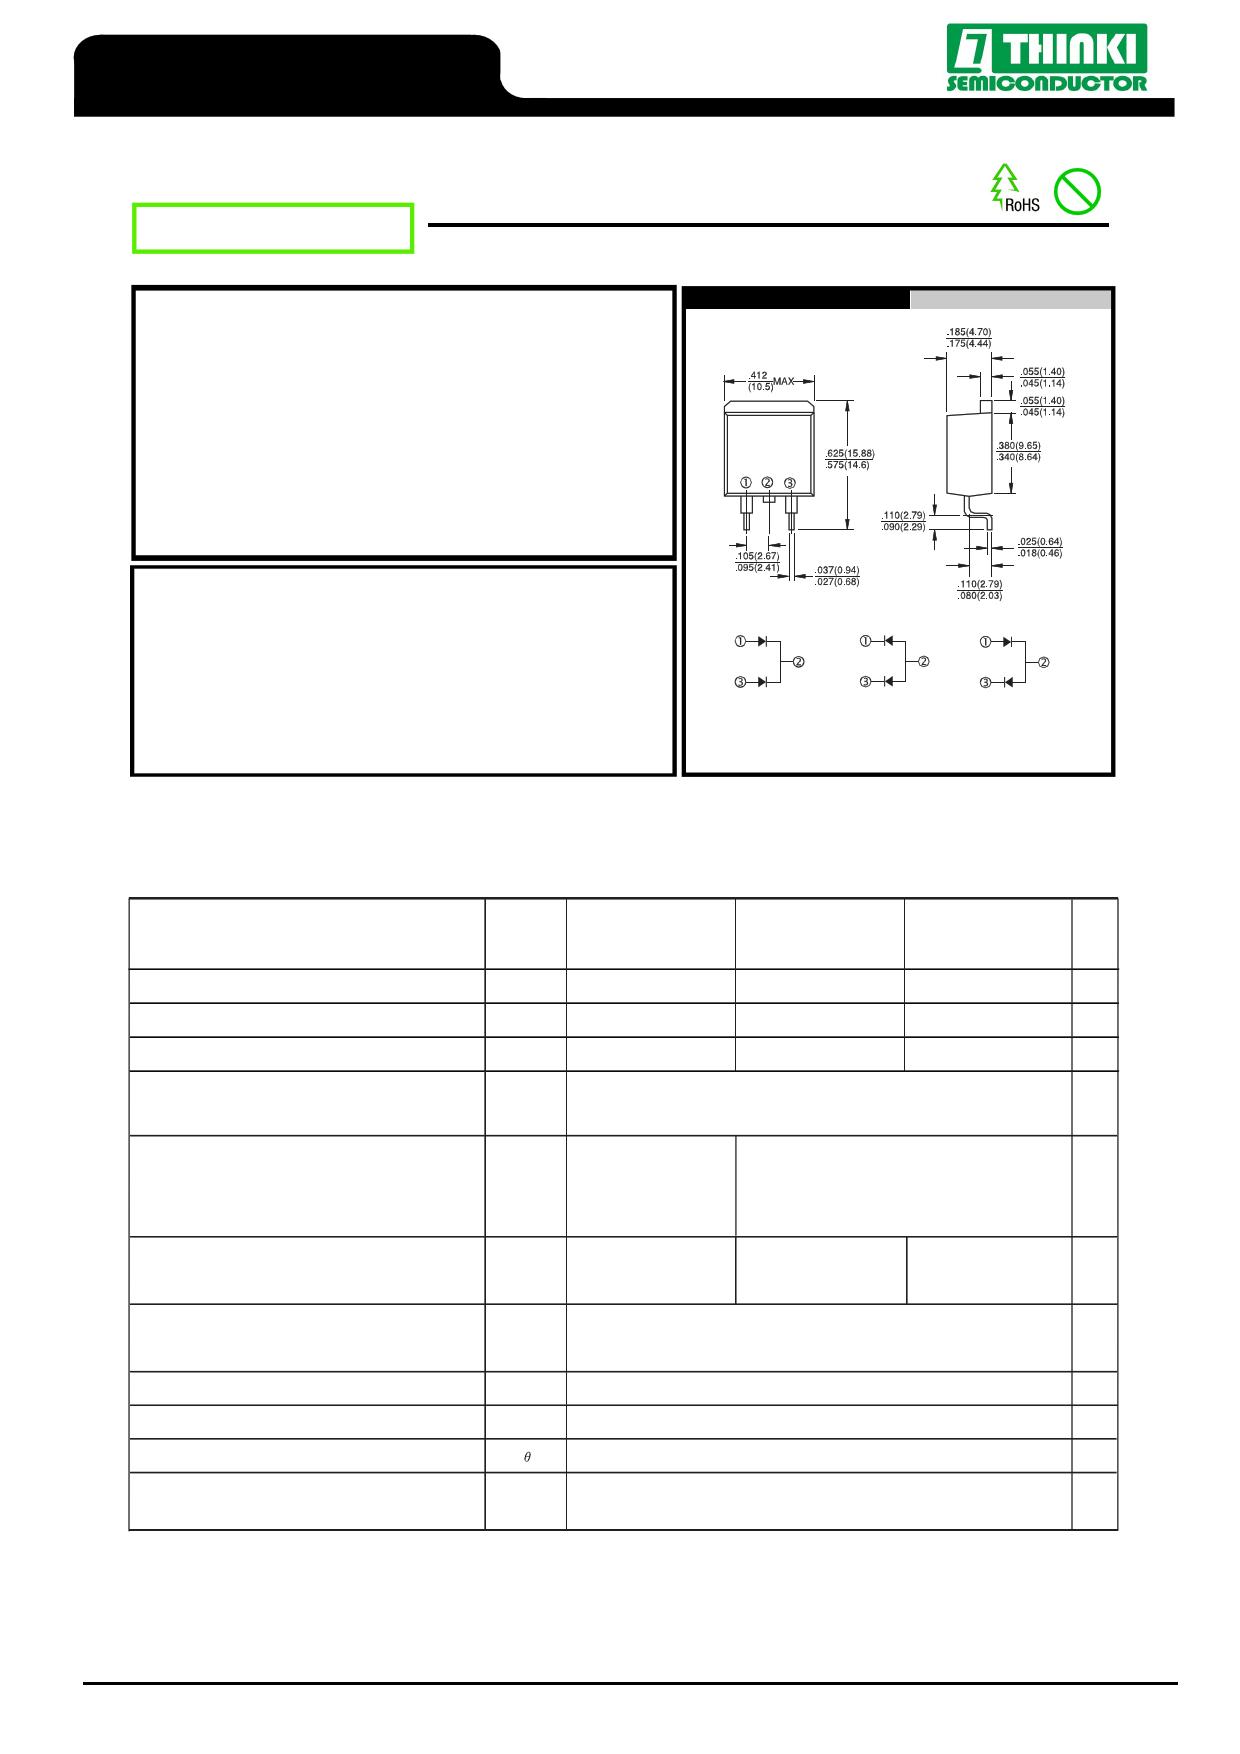 U1620G datasheet